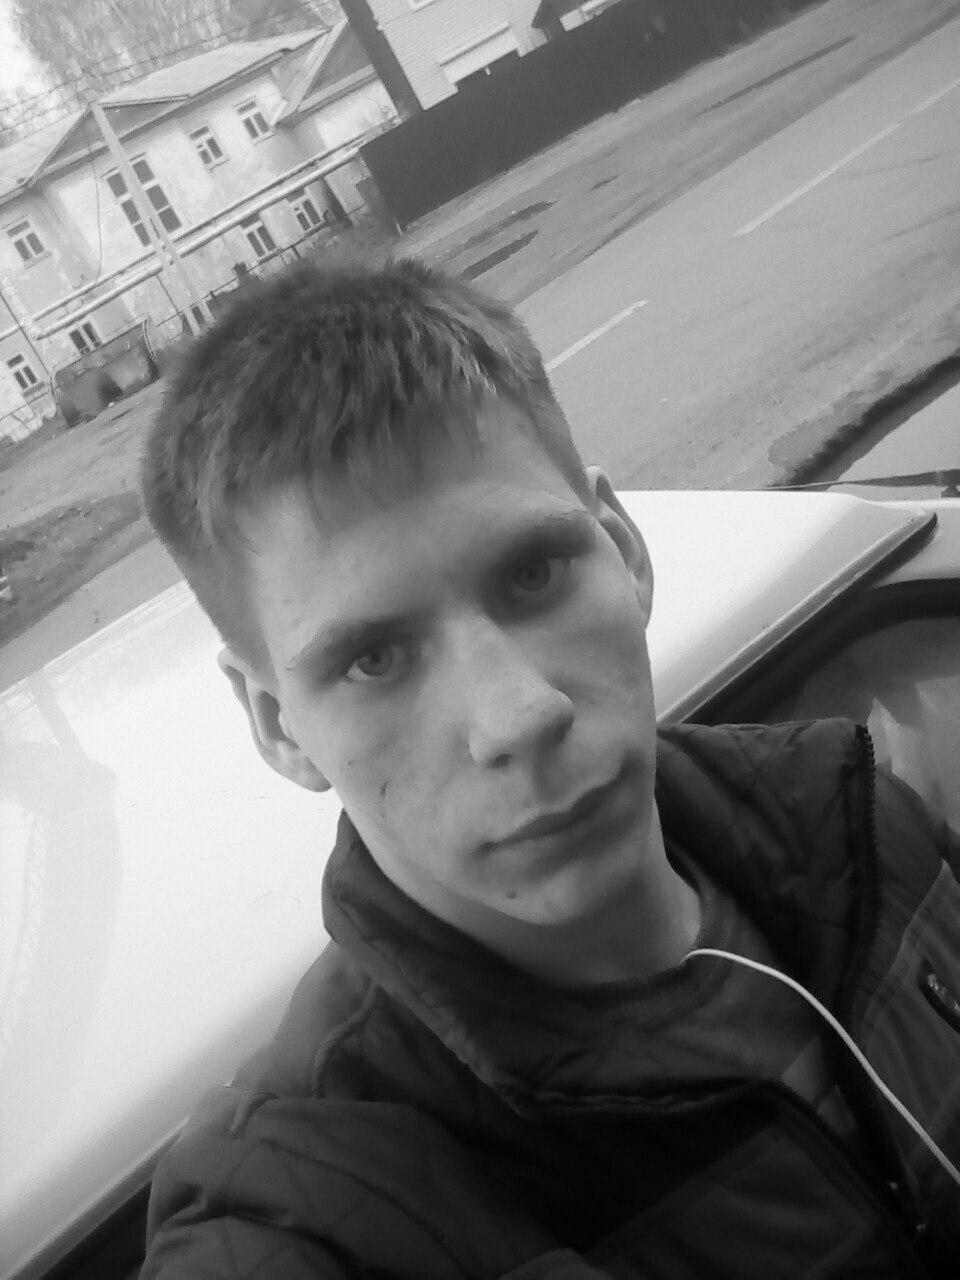 Roman, 20, Yaya